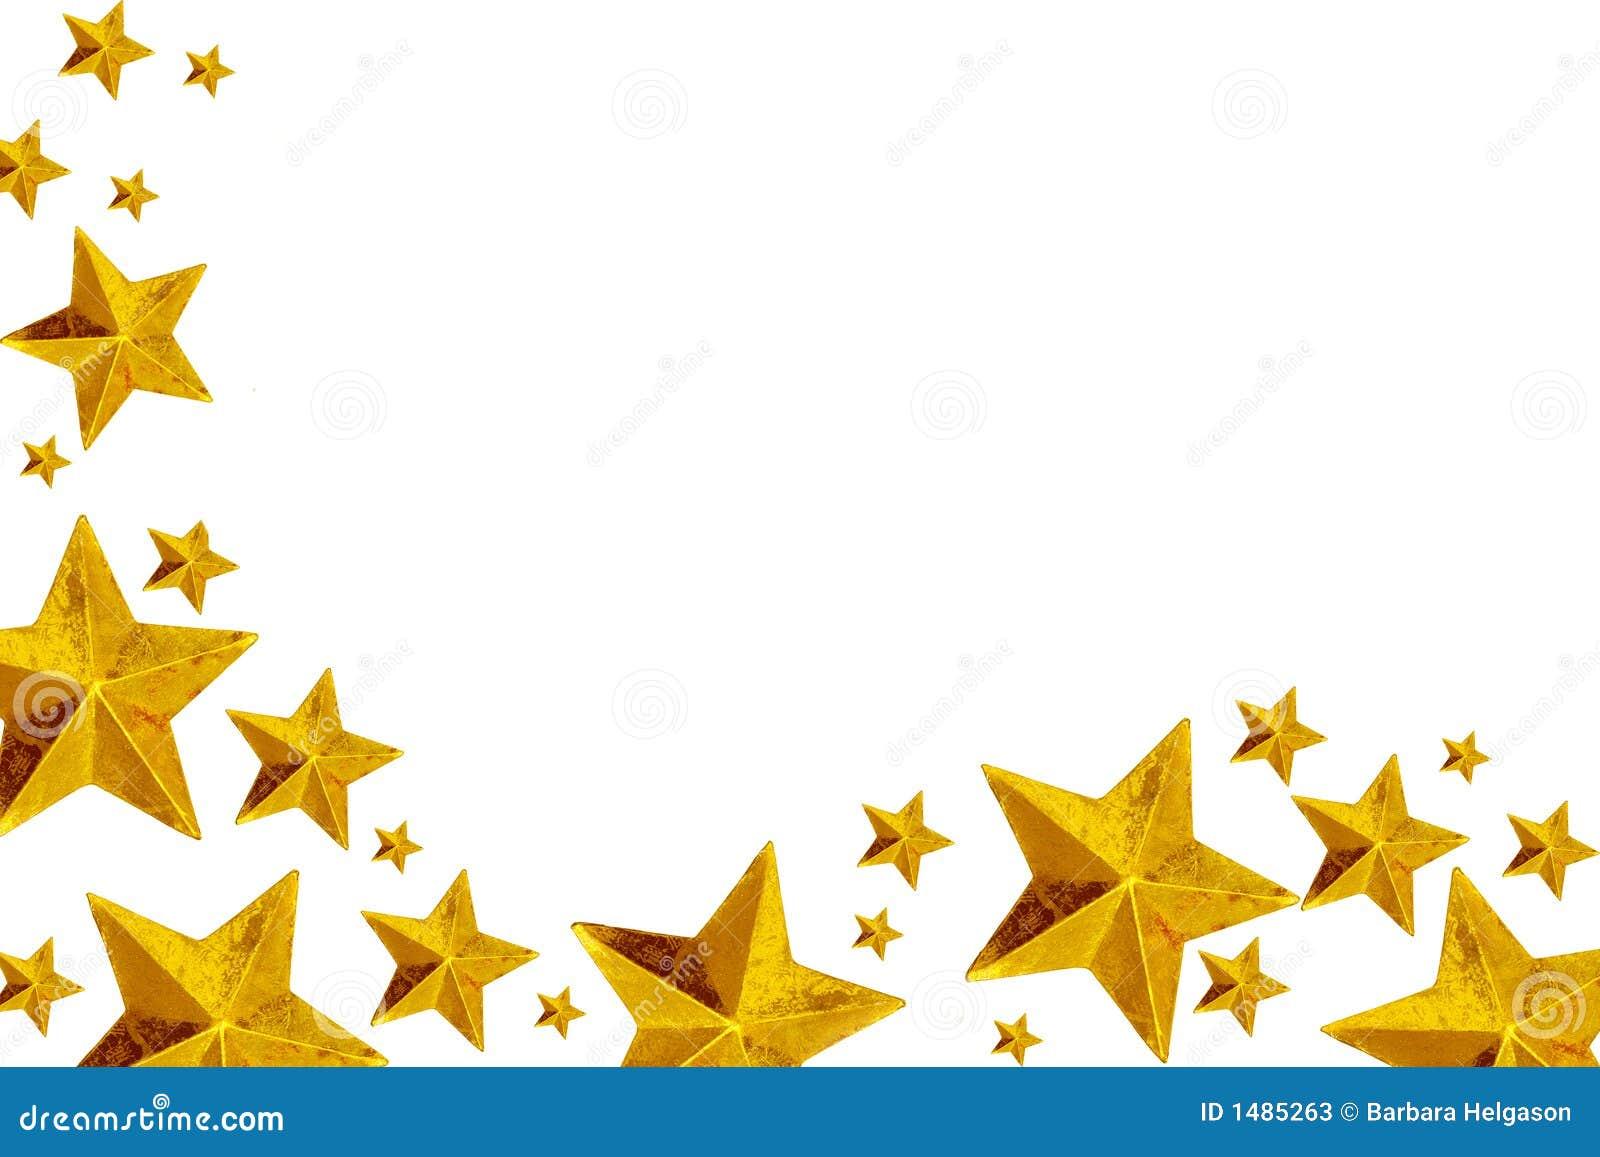 christmas-star-1485263.jpg